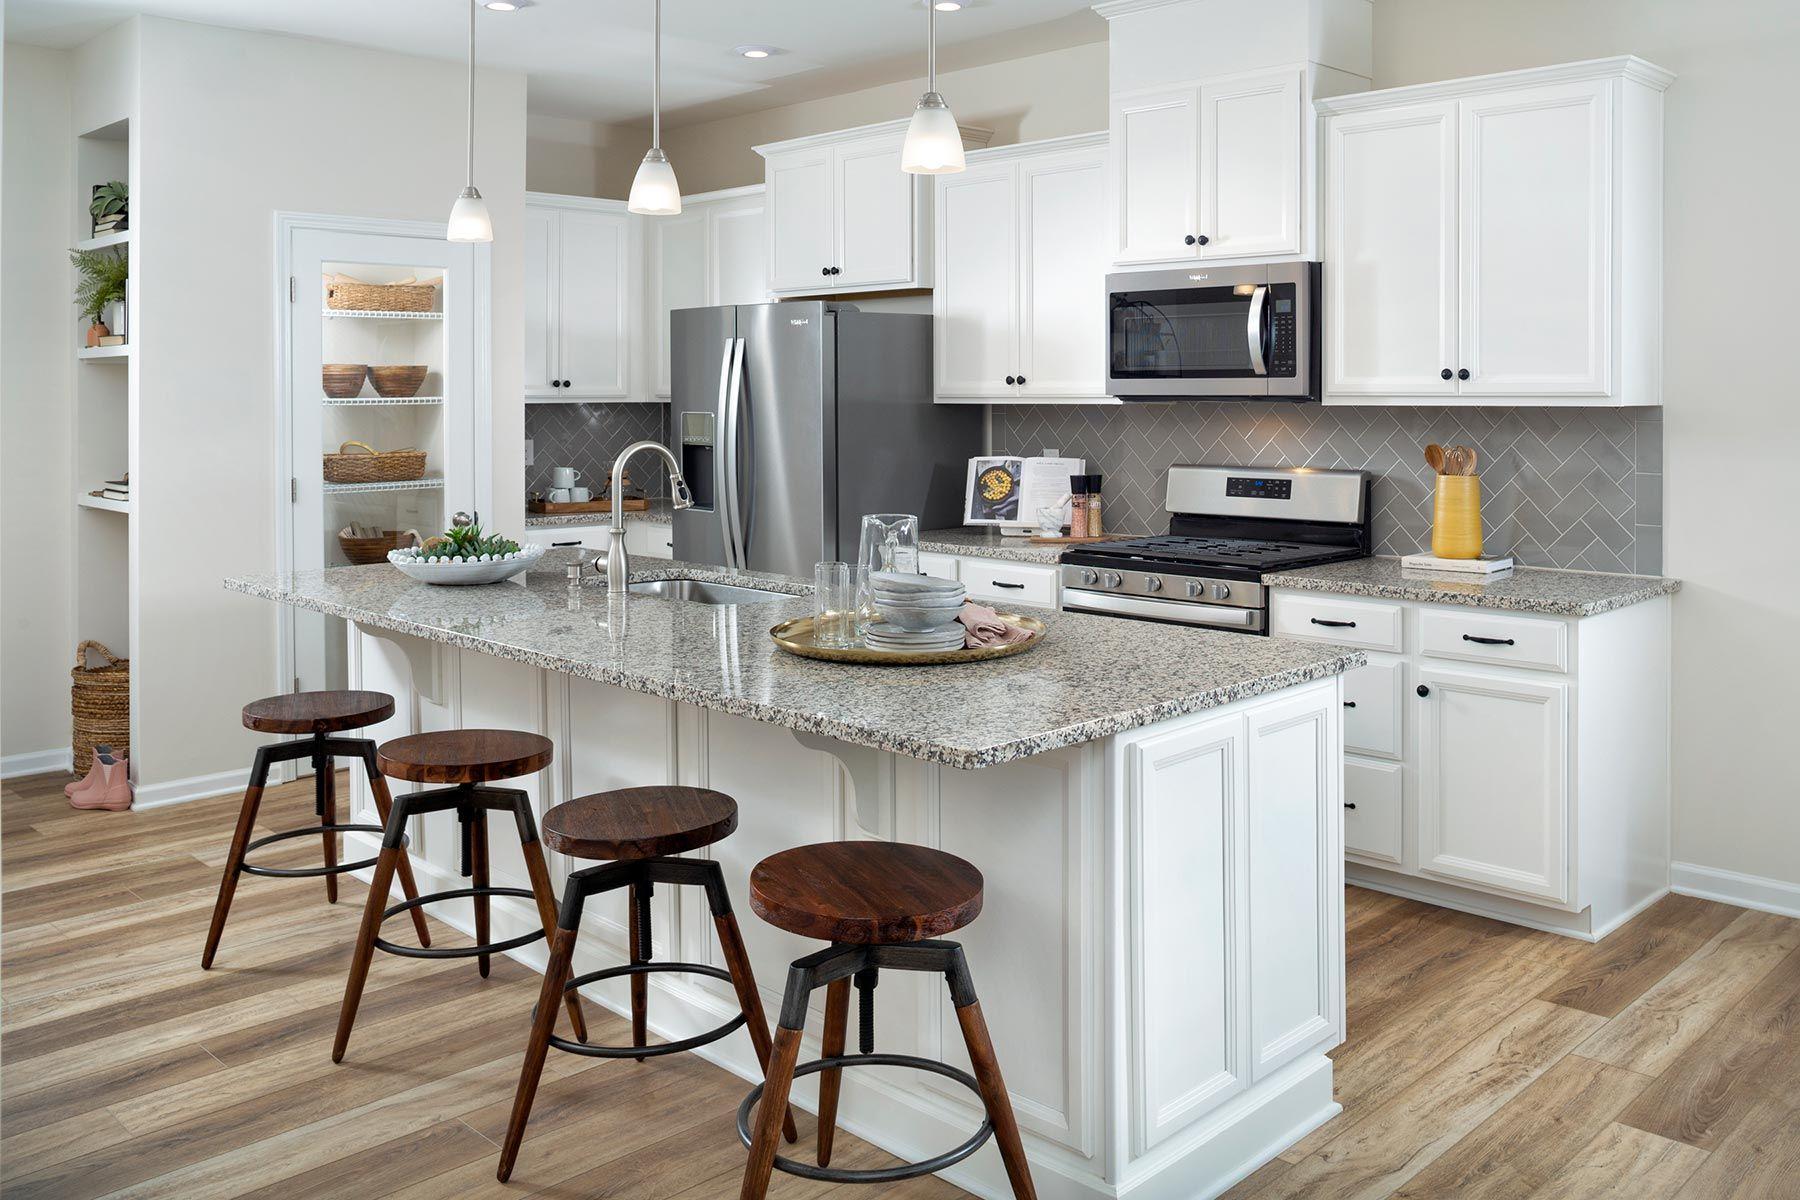 Charlotte - Galloway Park:Ava Model Kitchen